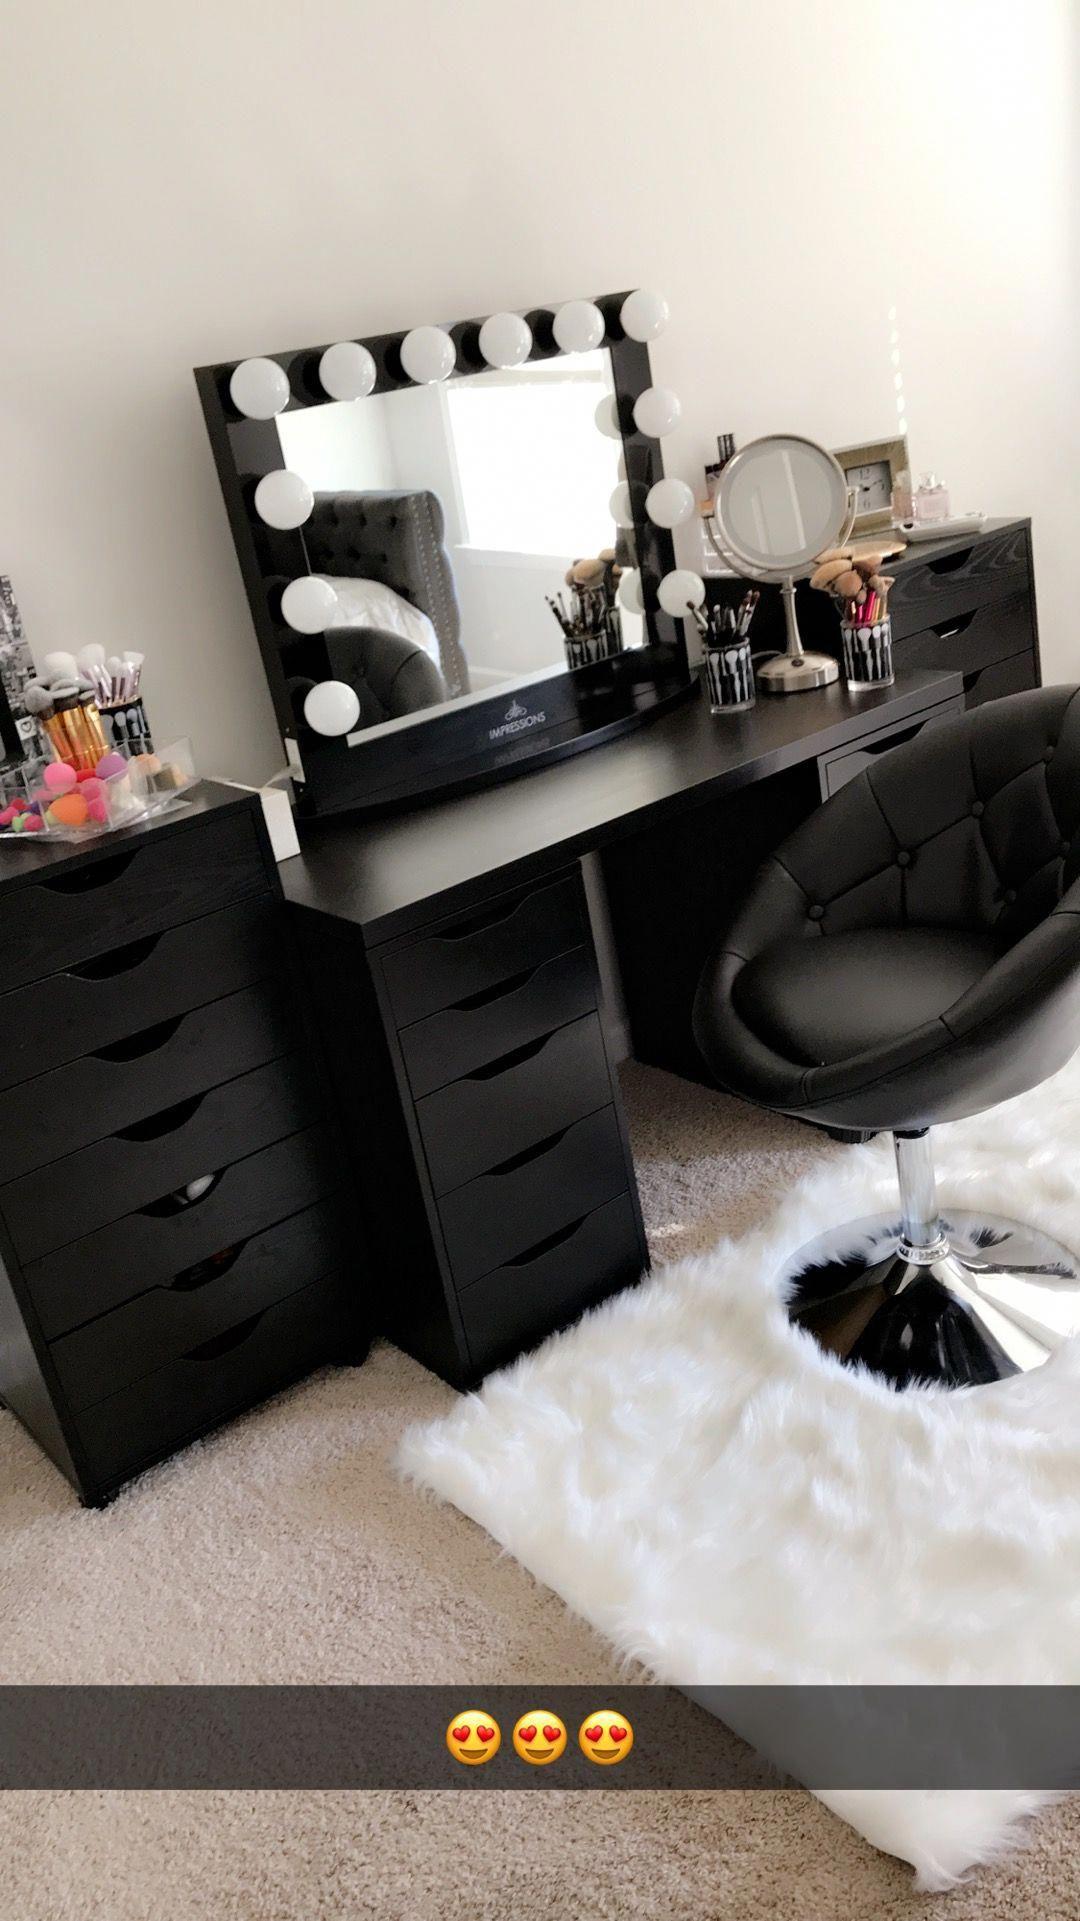 Beautiful Black Vanity Makeup Room Has Ikea Alex Drawers And Linnmon Table Top Makeupvanity Ikea Alex Drawers Makeup Room Decor Room Ideas Bedroom